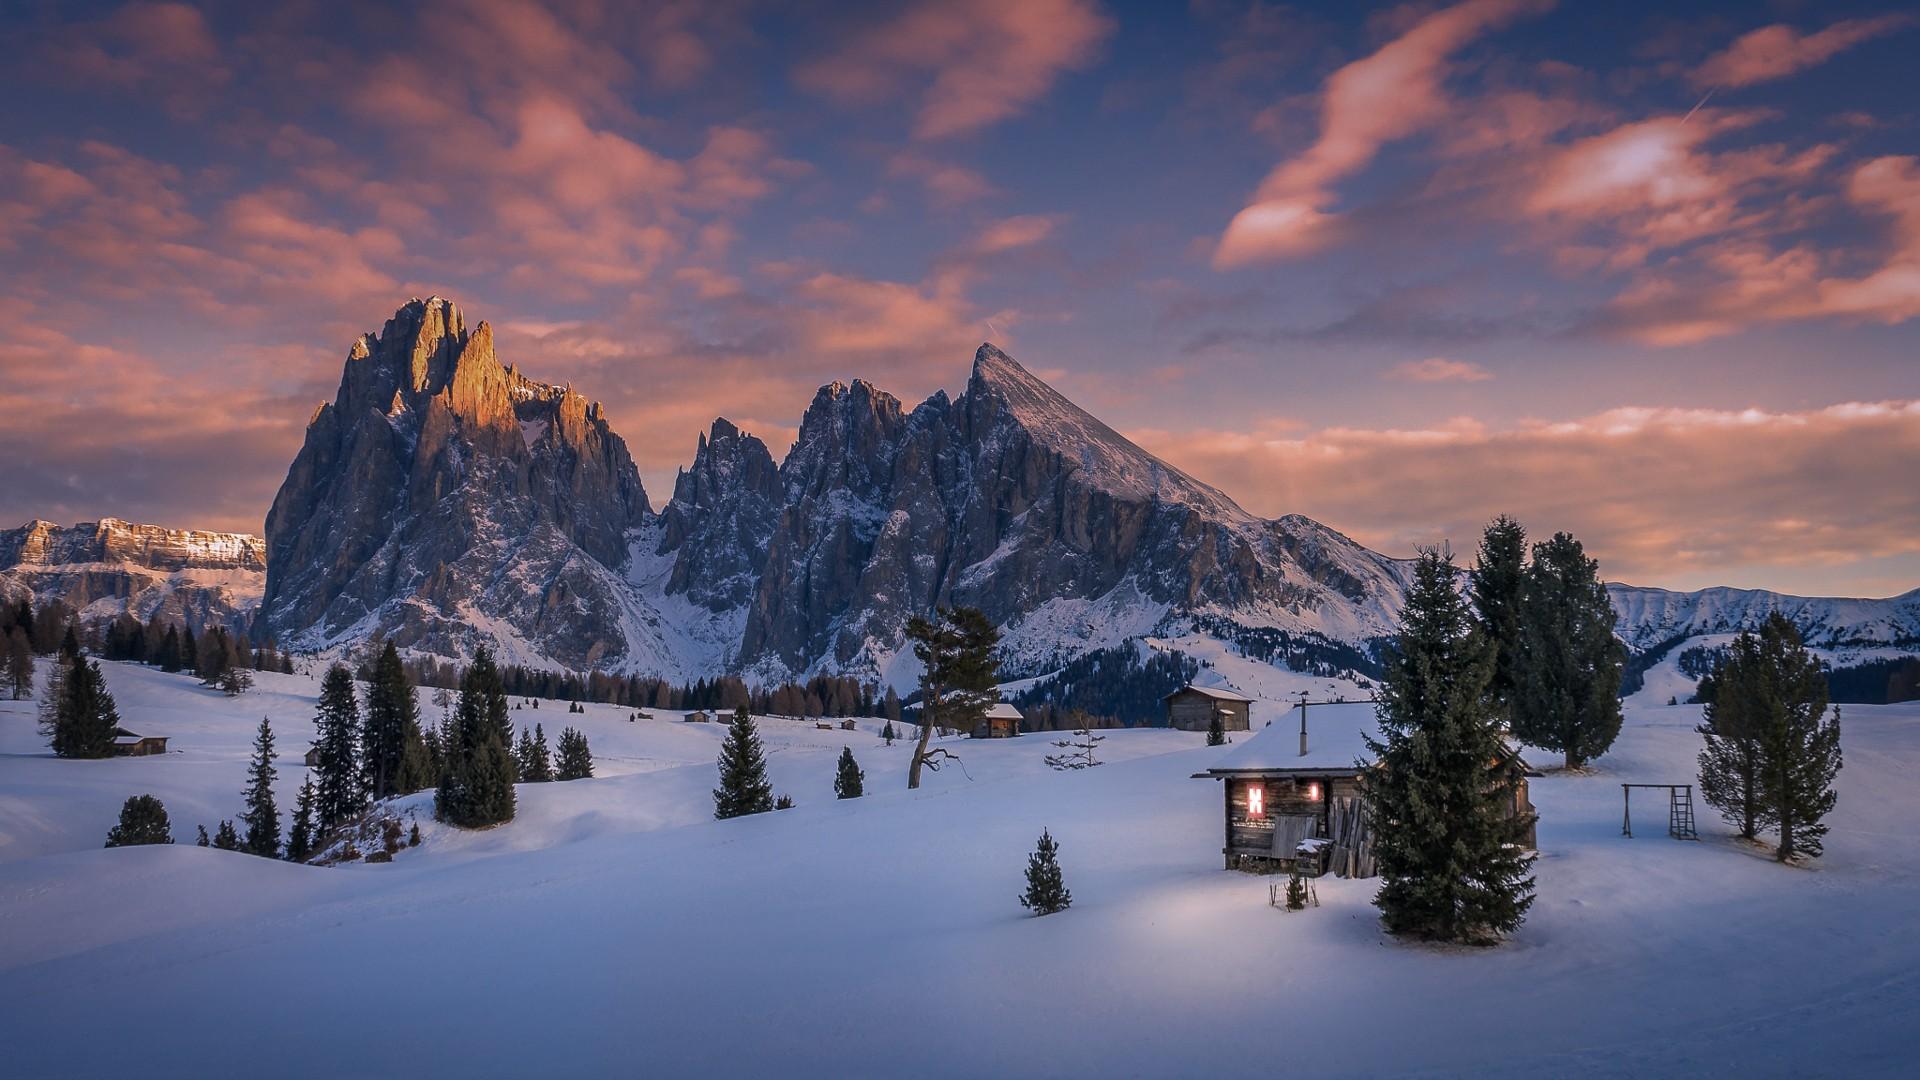 любом фотообои на комп зима в горах ваша визитная